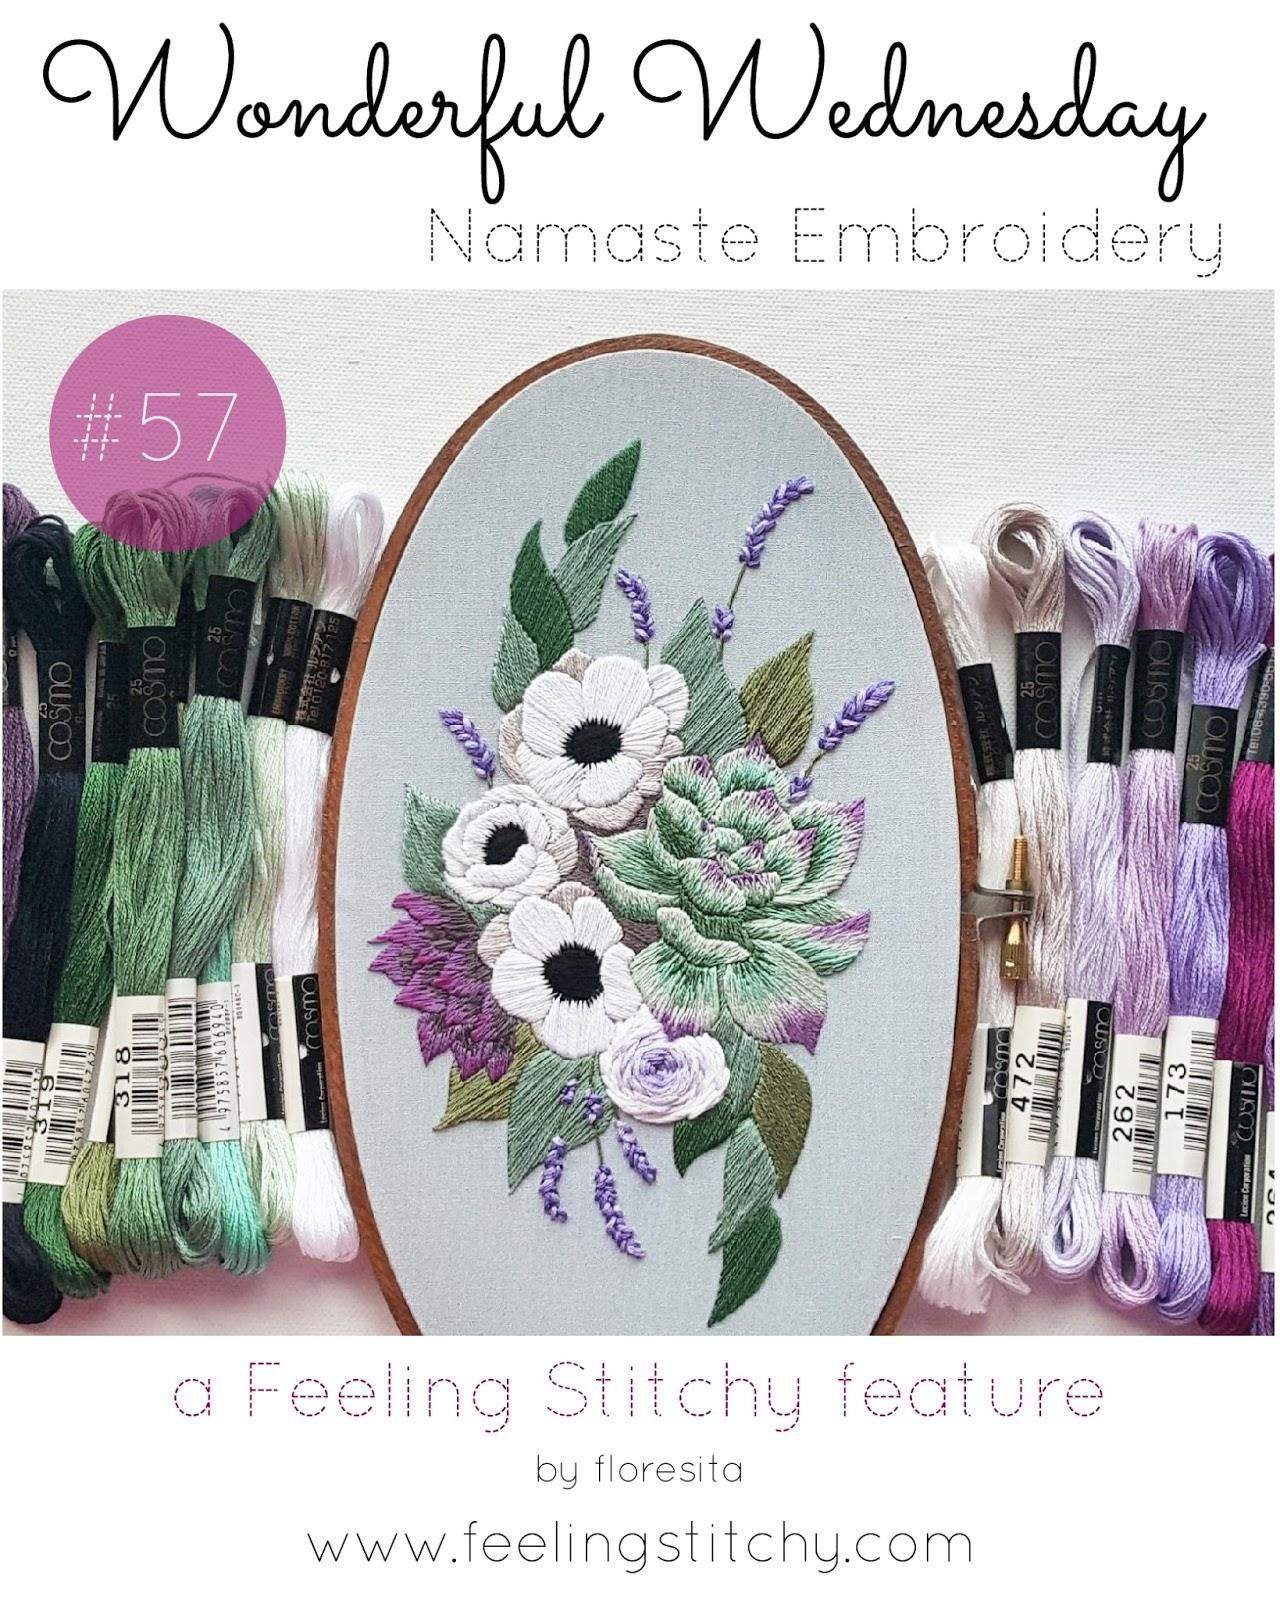 Wonderful Wednesday 57 - Namaste Embroidery, featured on Feeling Stitchy by floresita